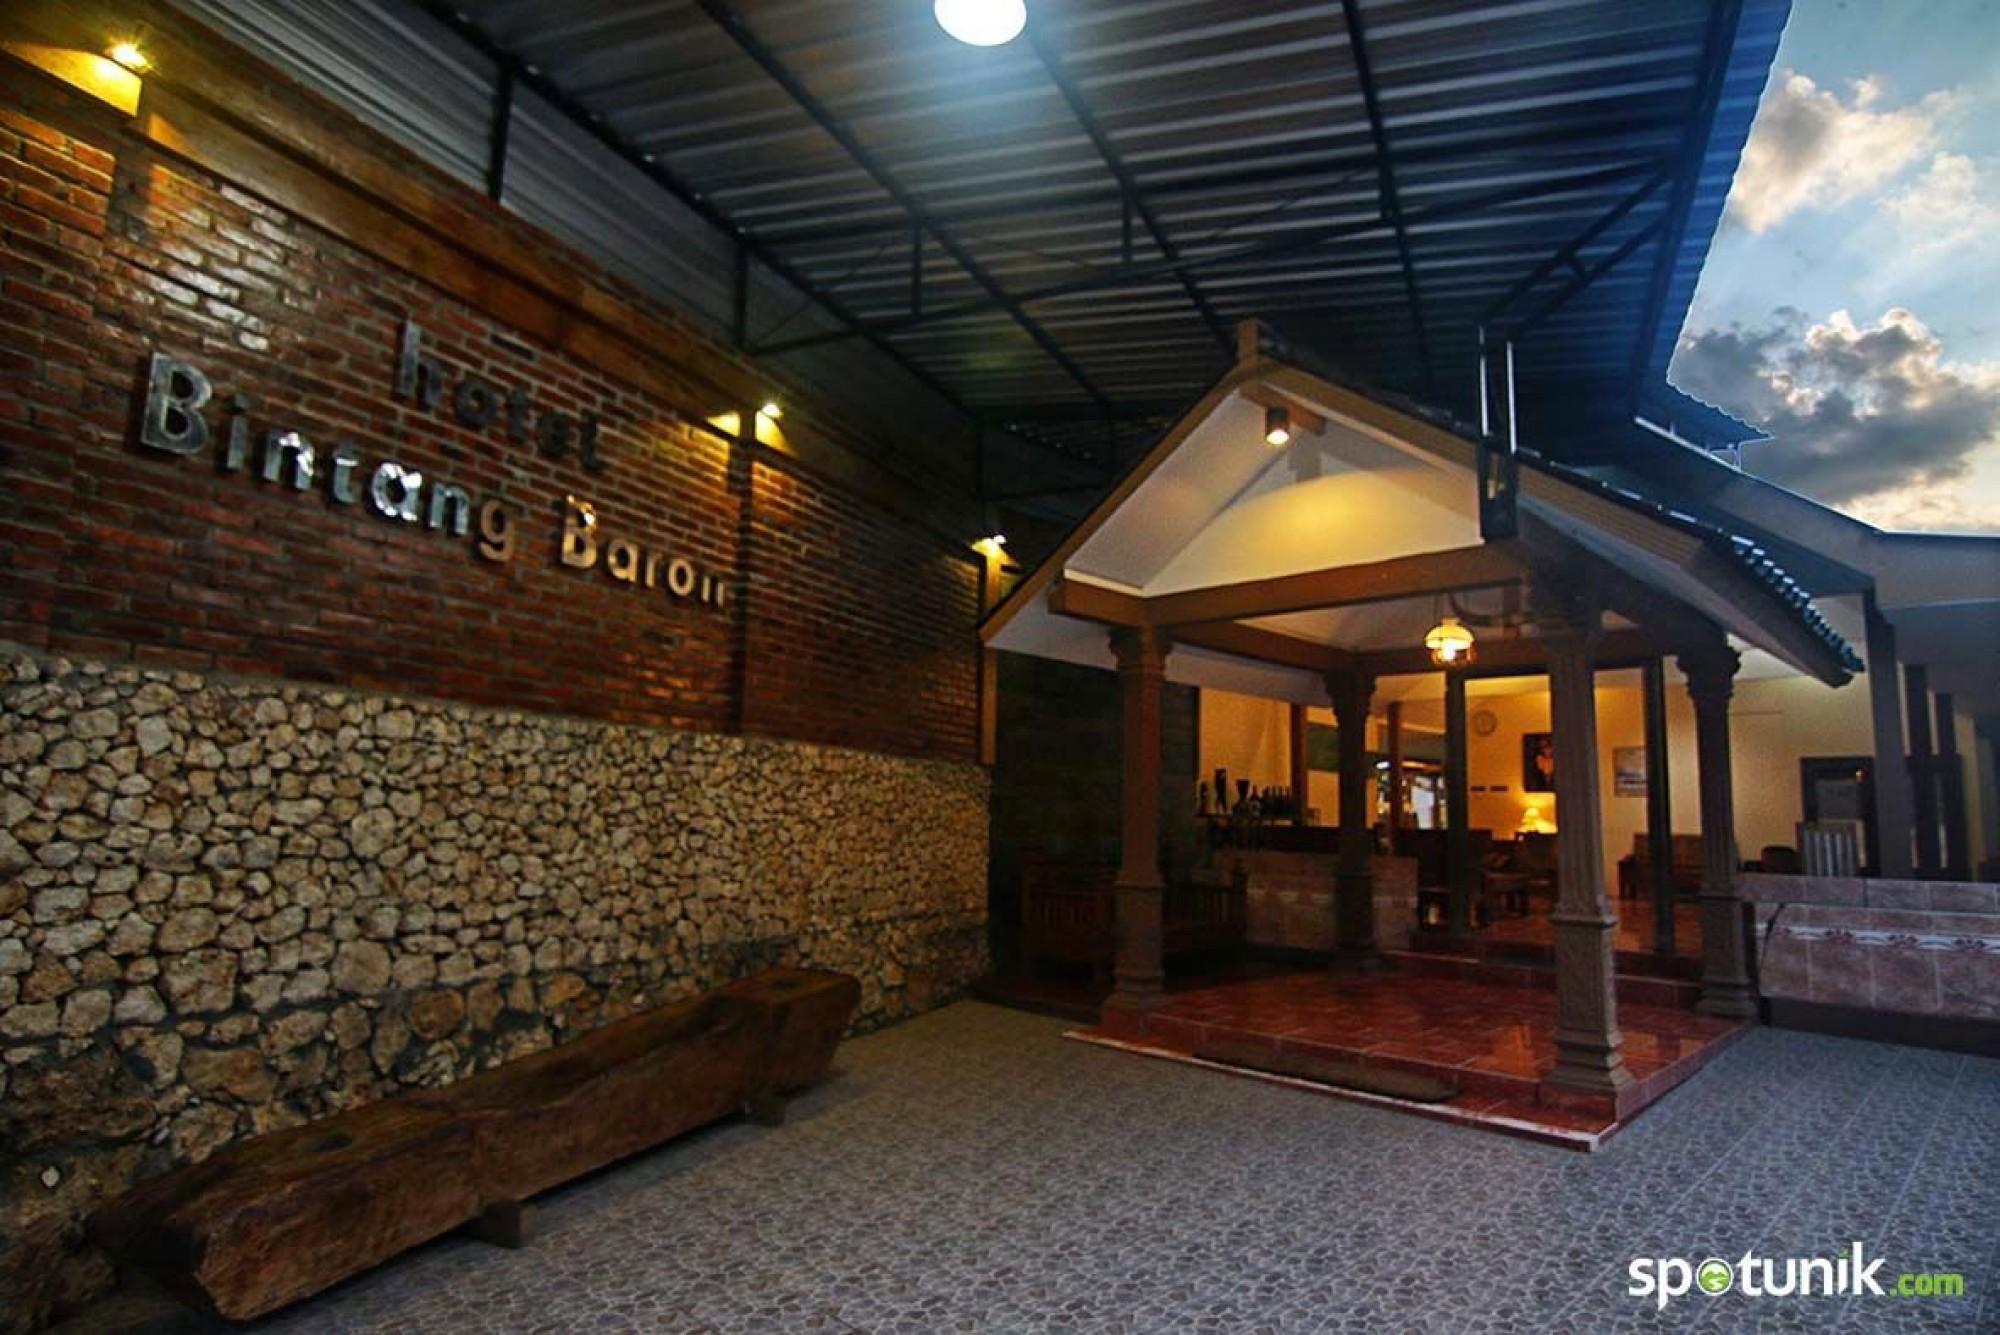 Hotel Bintang Baron Ketika Keindahan Berbalut Kenyamanan Technopark Gunung Kidul